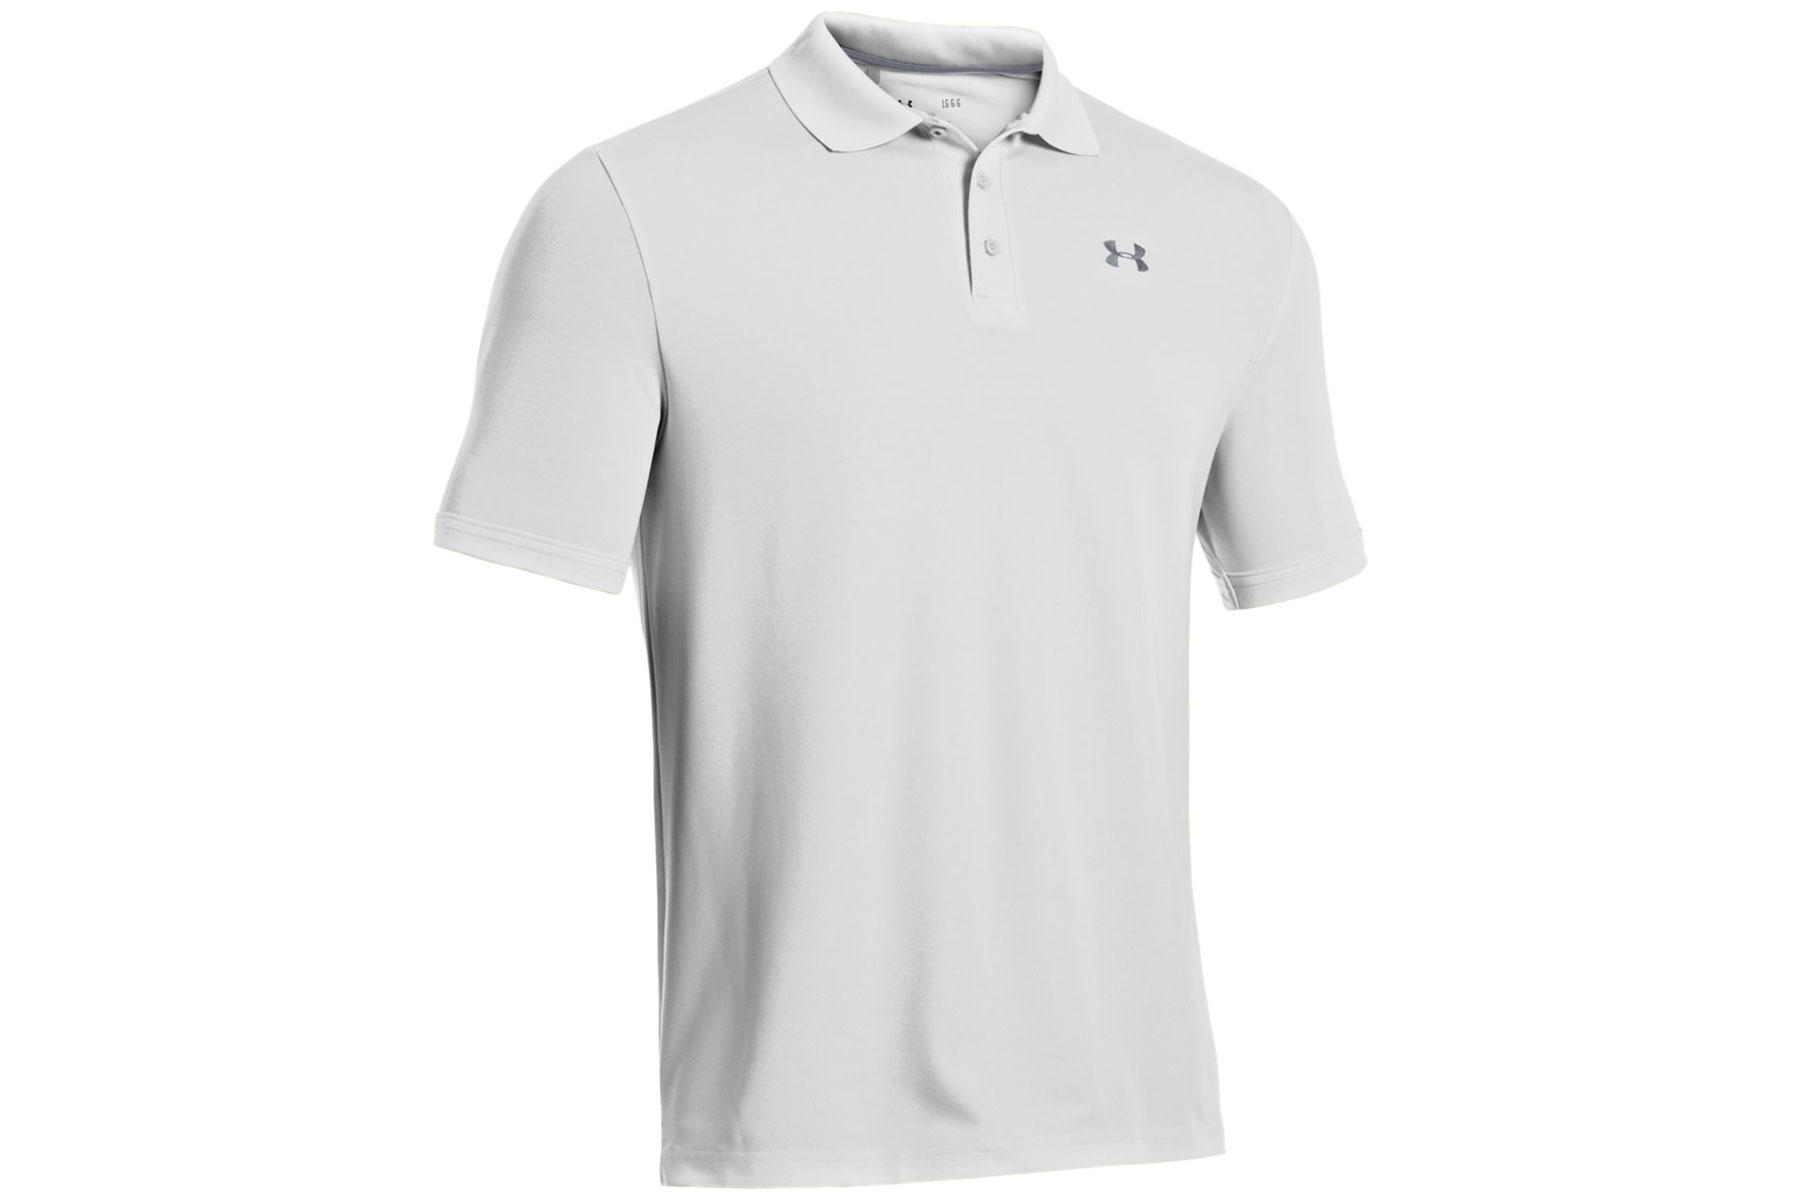 Under armour performance polo shirt online golf for Under armor polo shirt